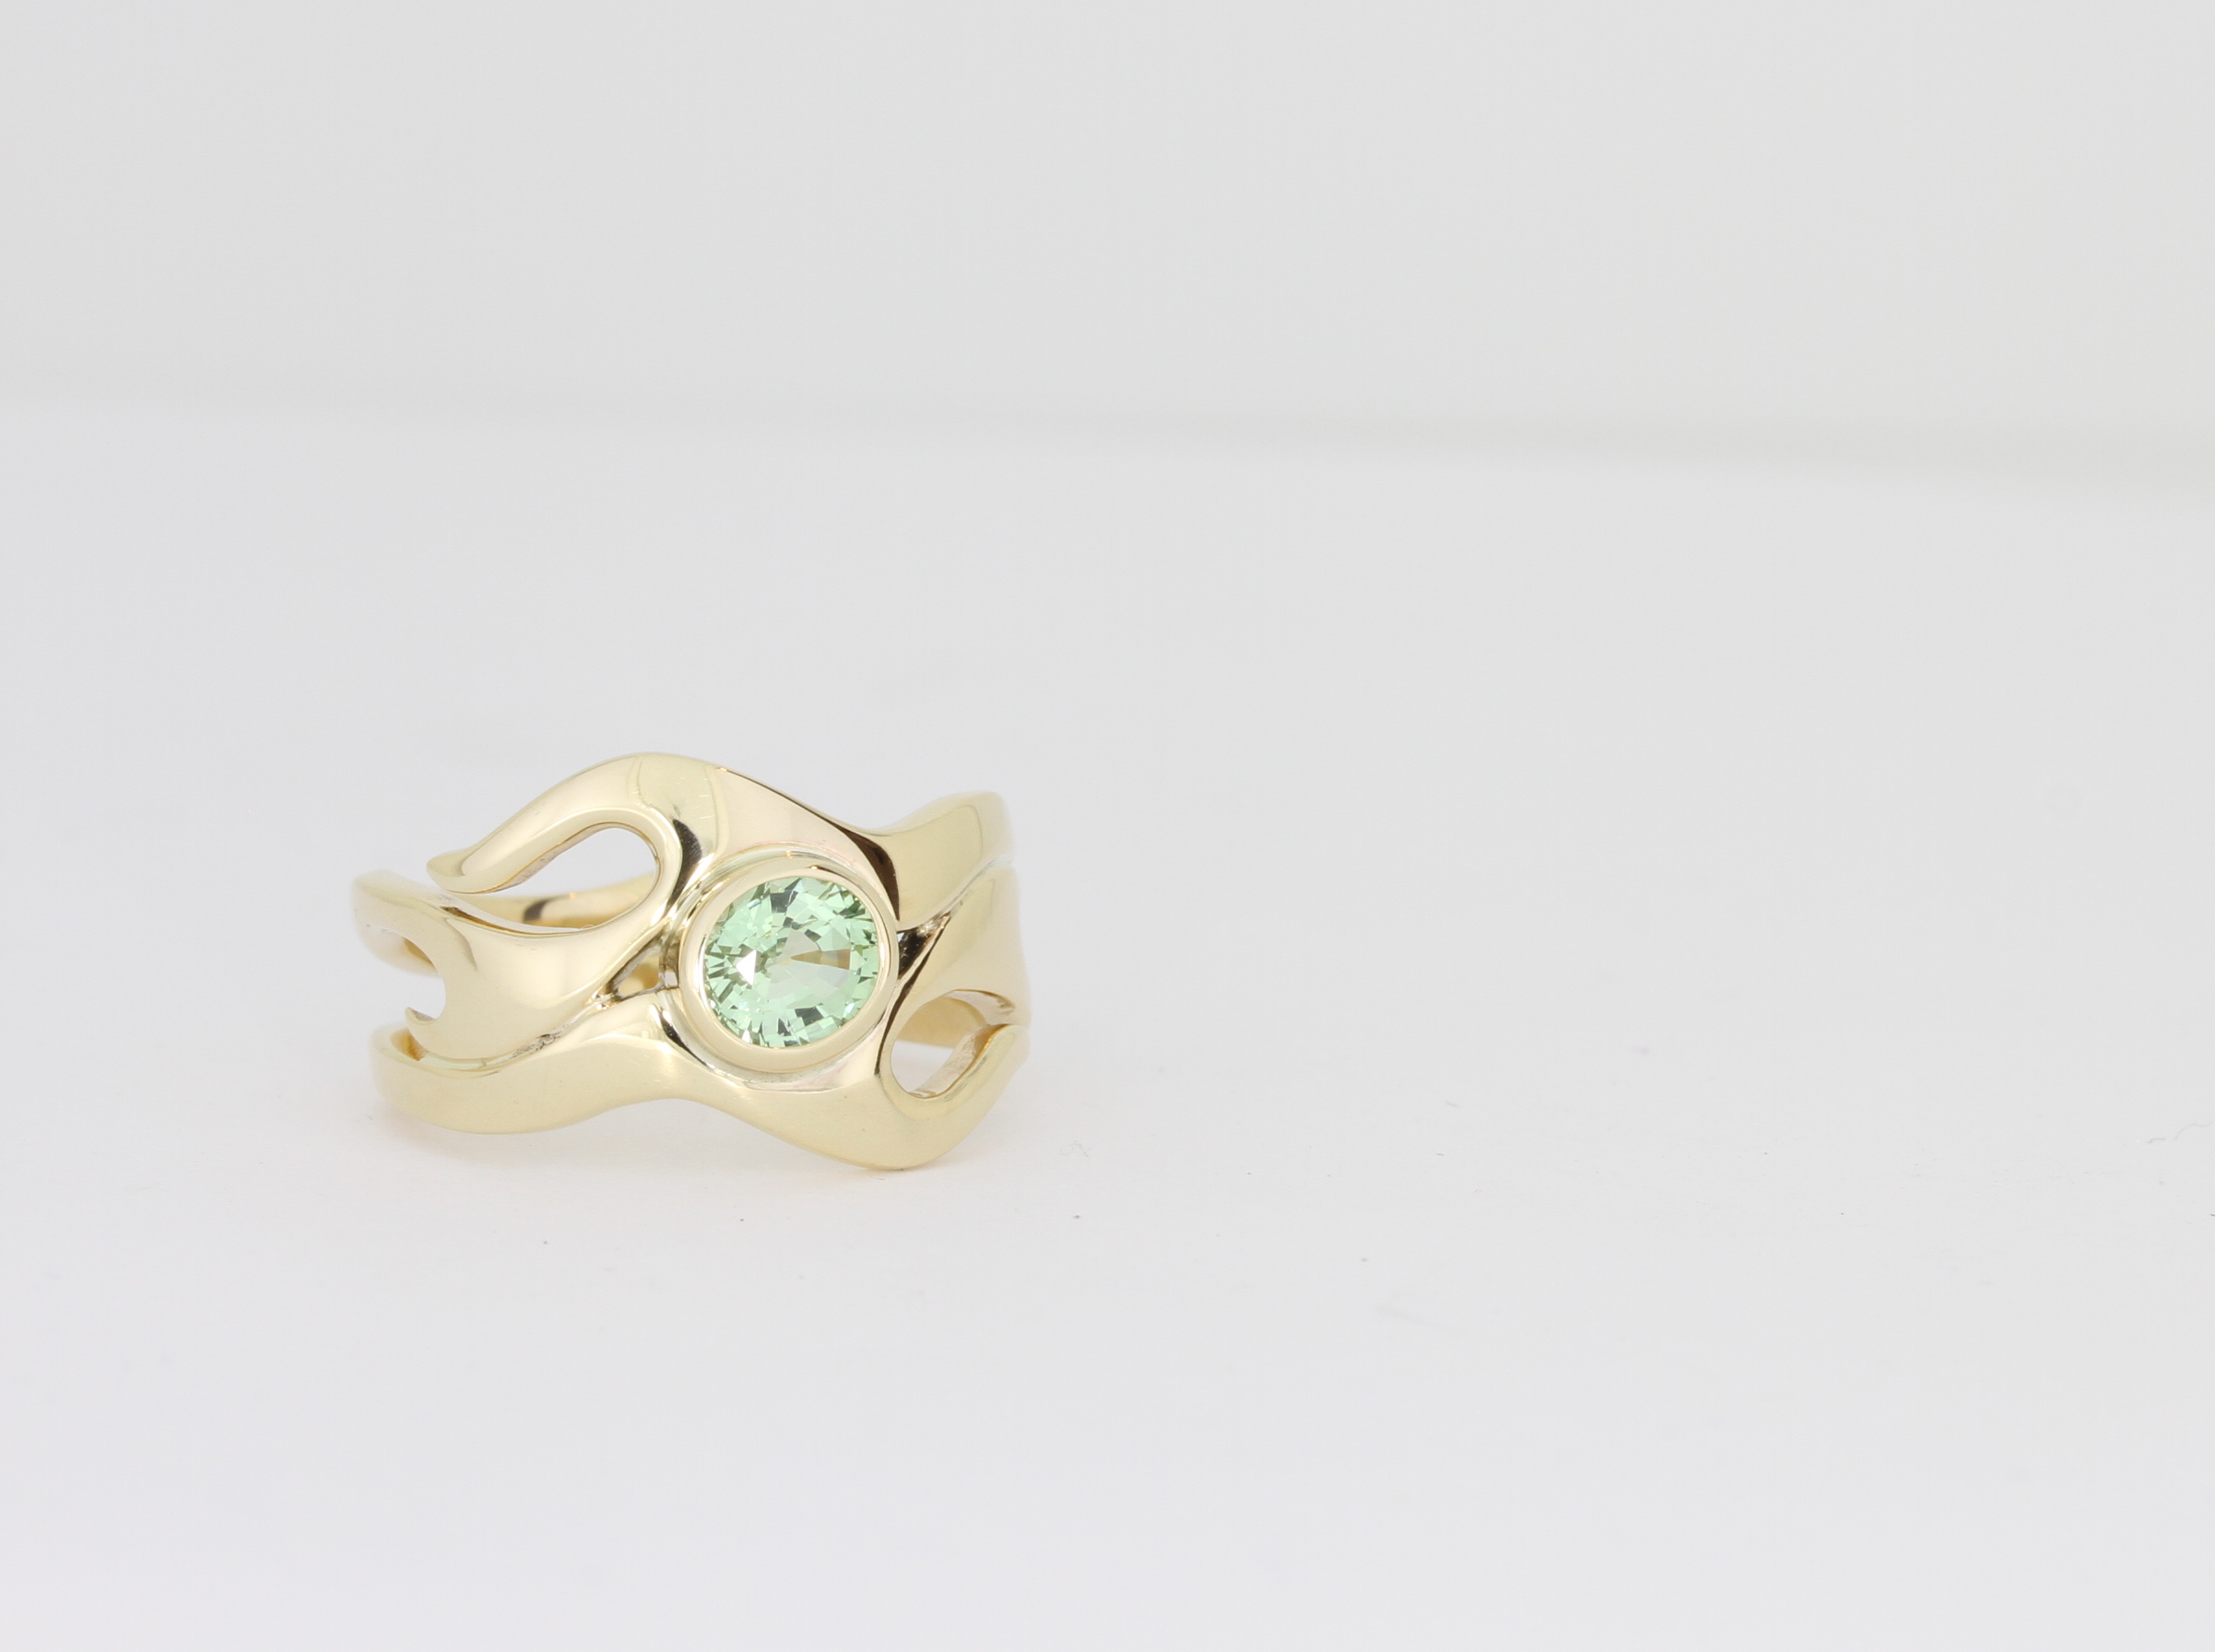 Payet-Green-Pool-Ring-green-quartz-set-in-9ct-yellow-gold.jpg